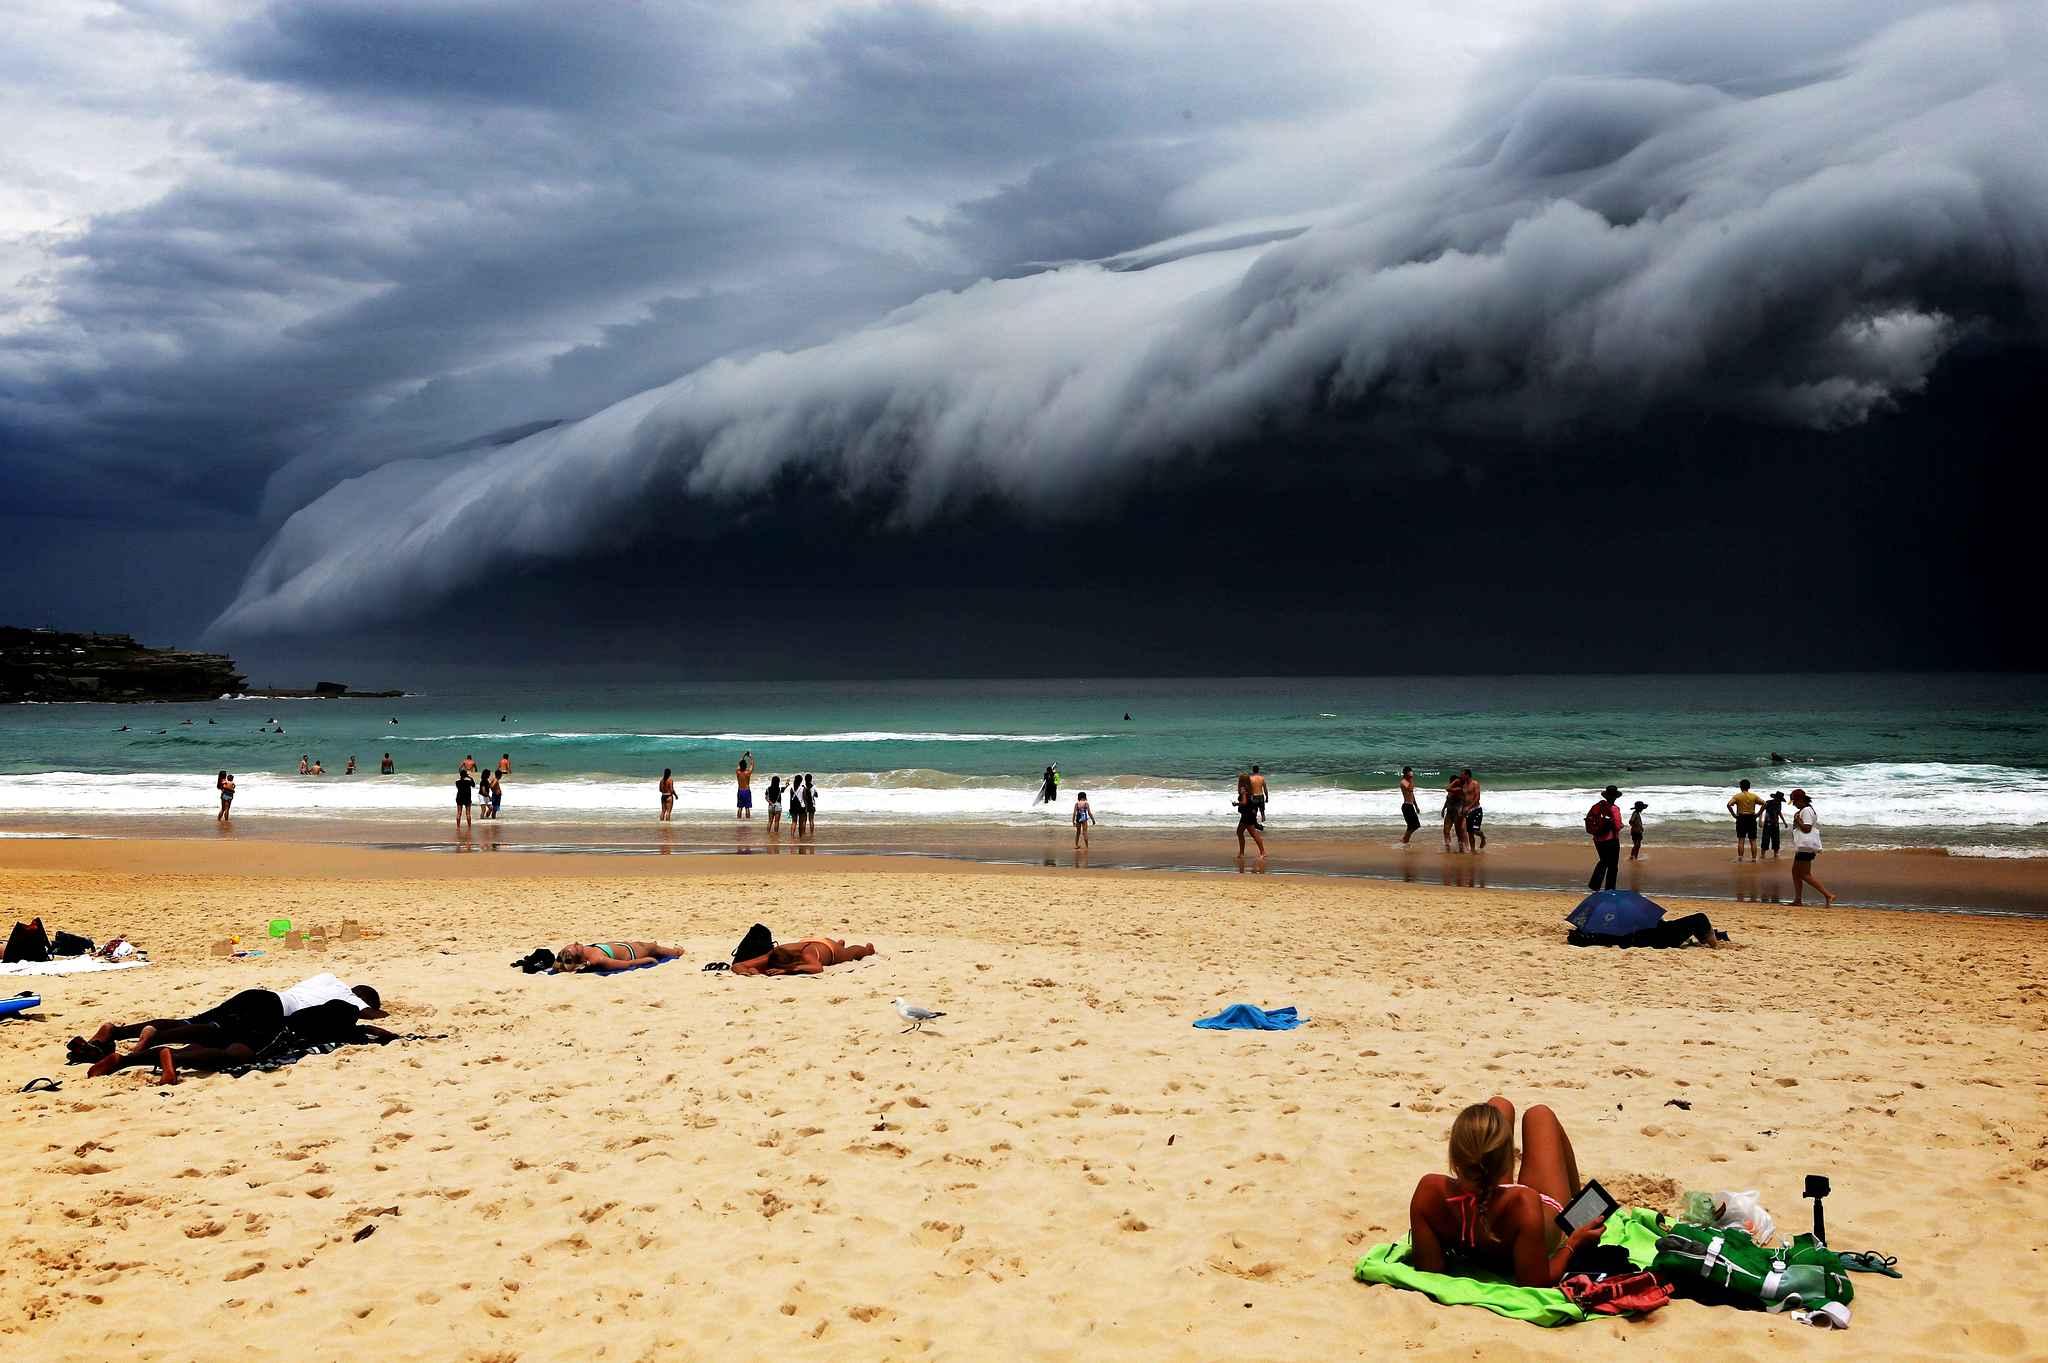 Bondi Beach Photograph by The Telegraph